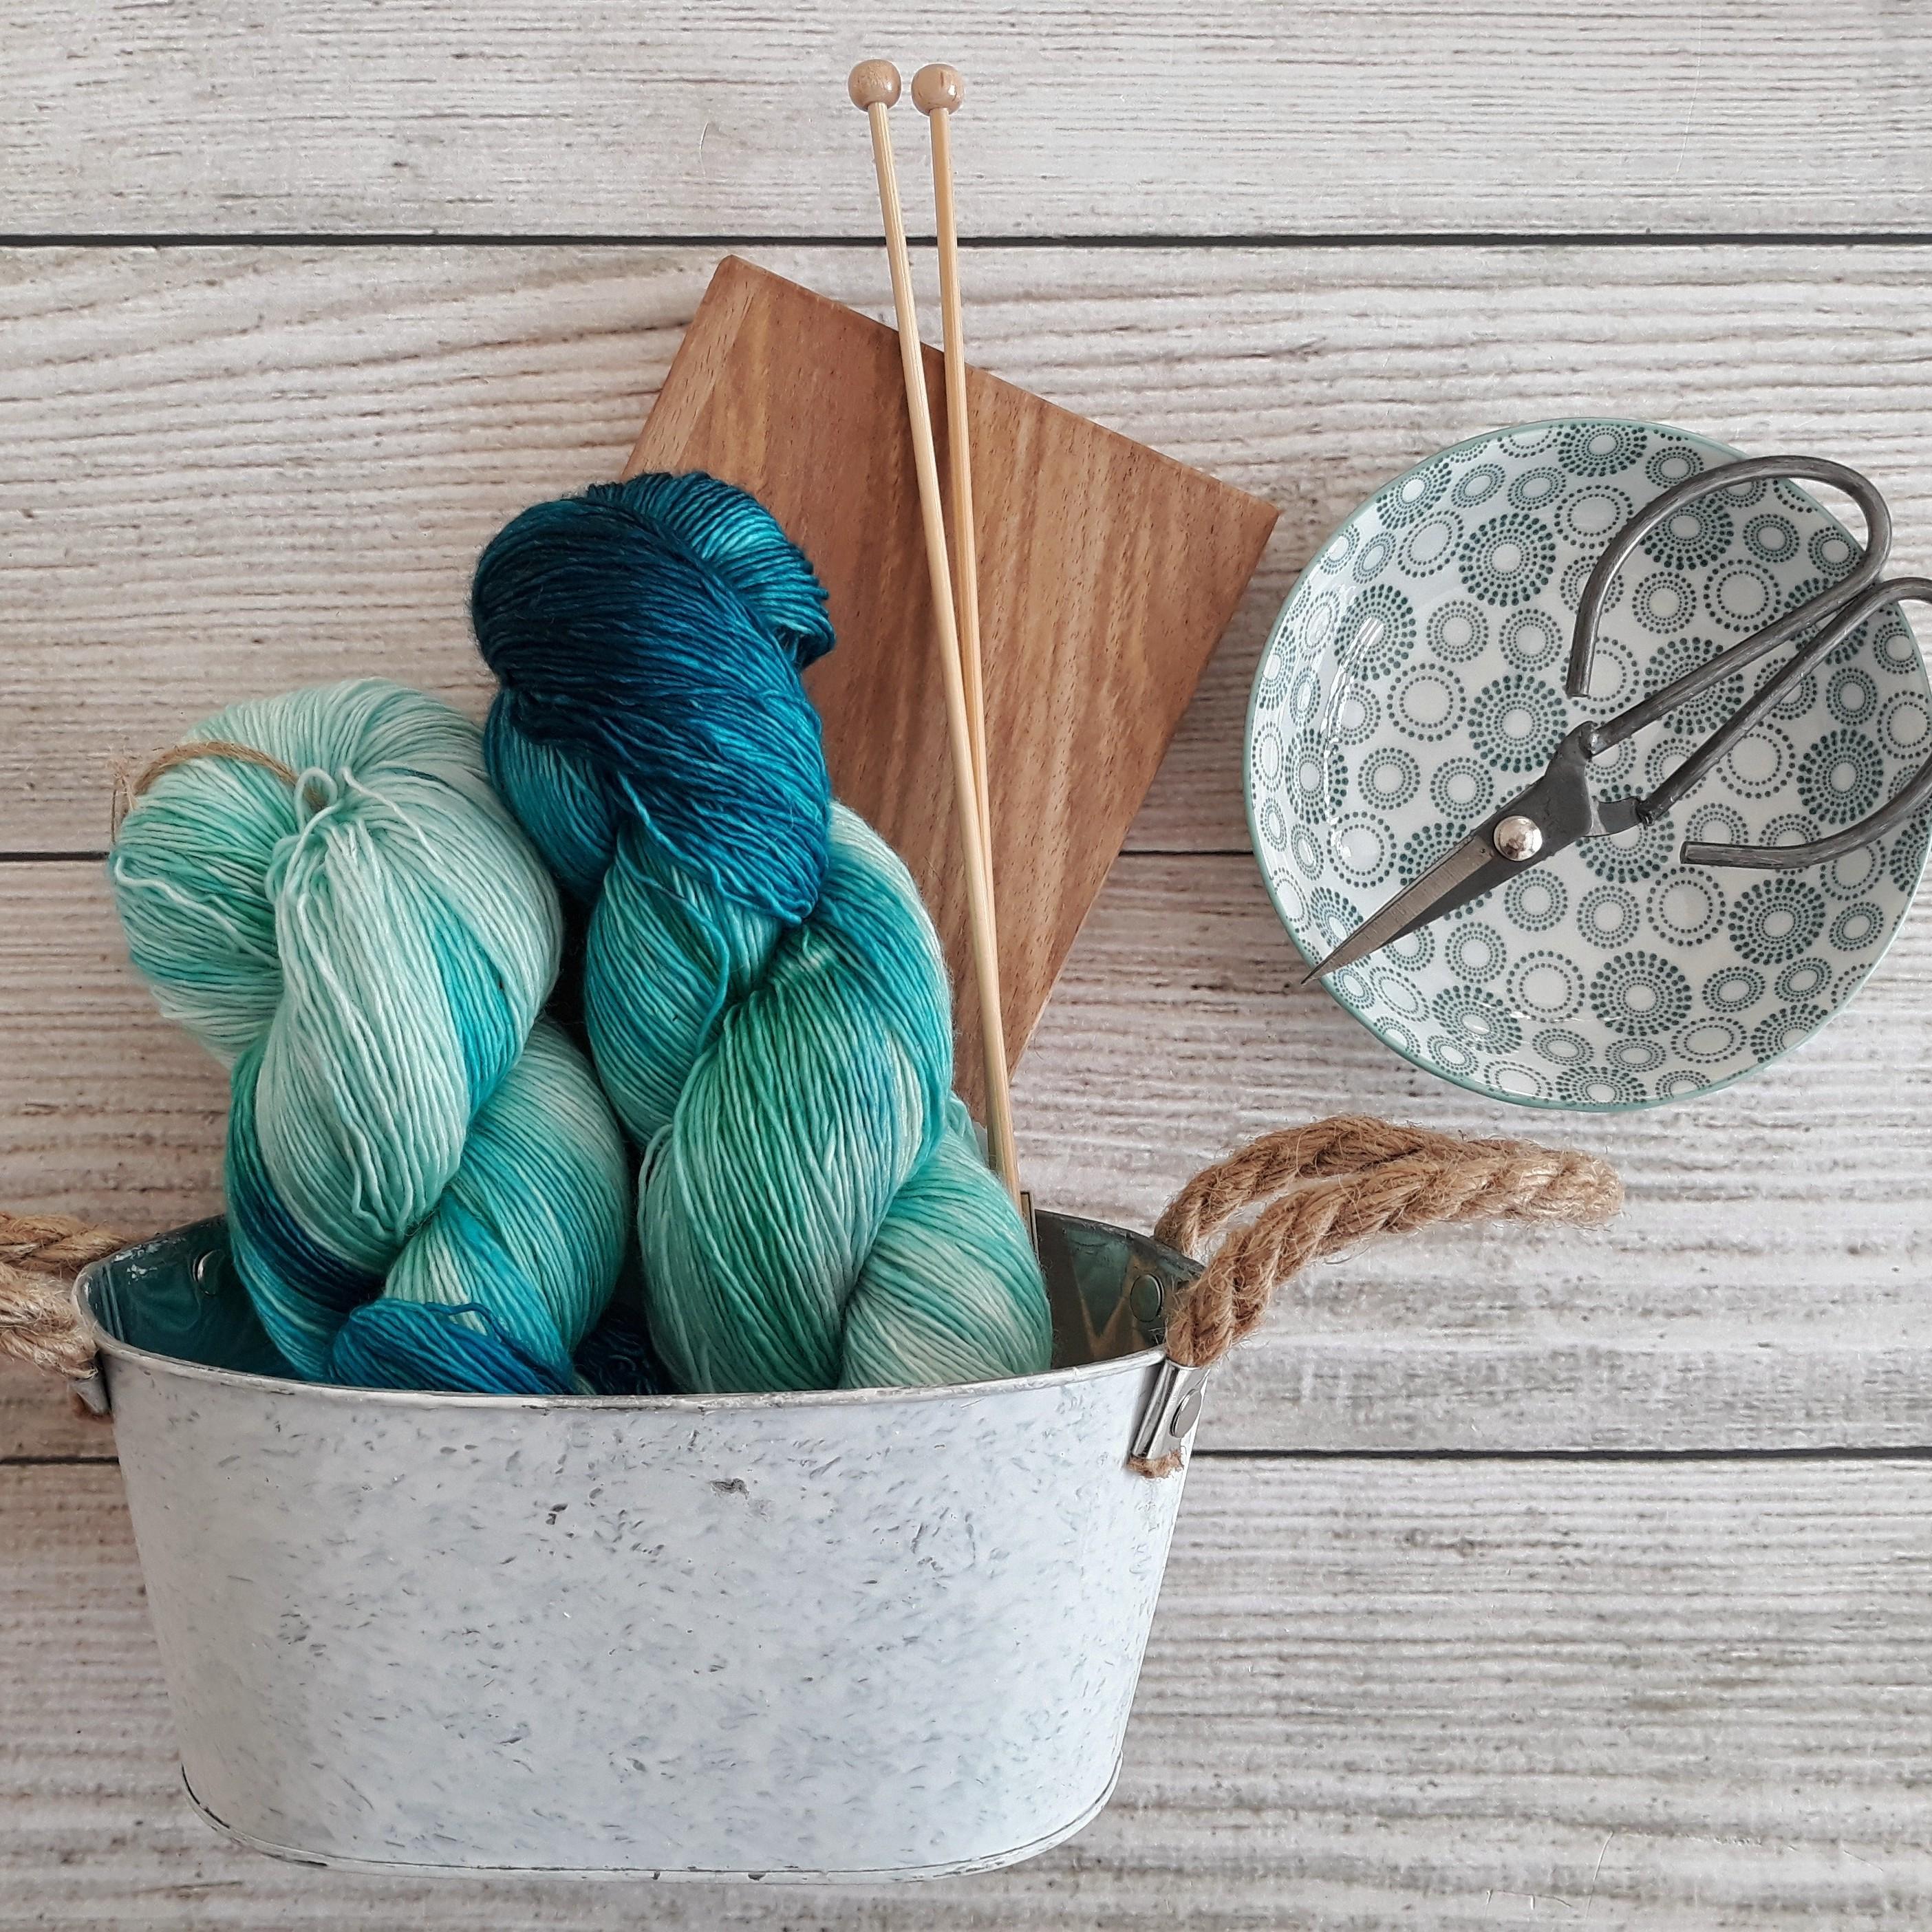 blue yarn in a tin bucket